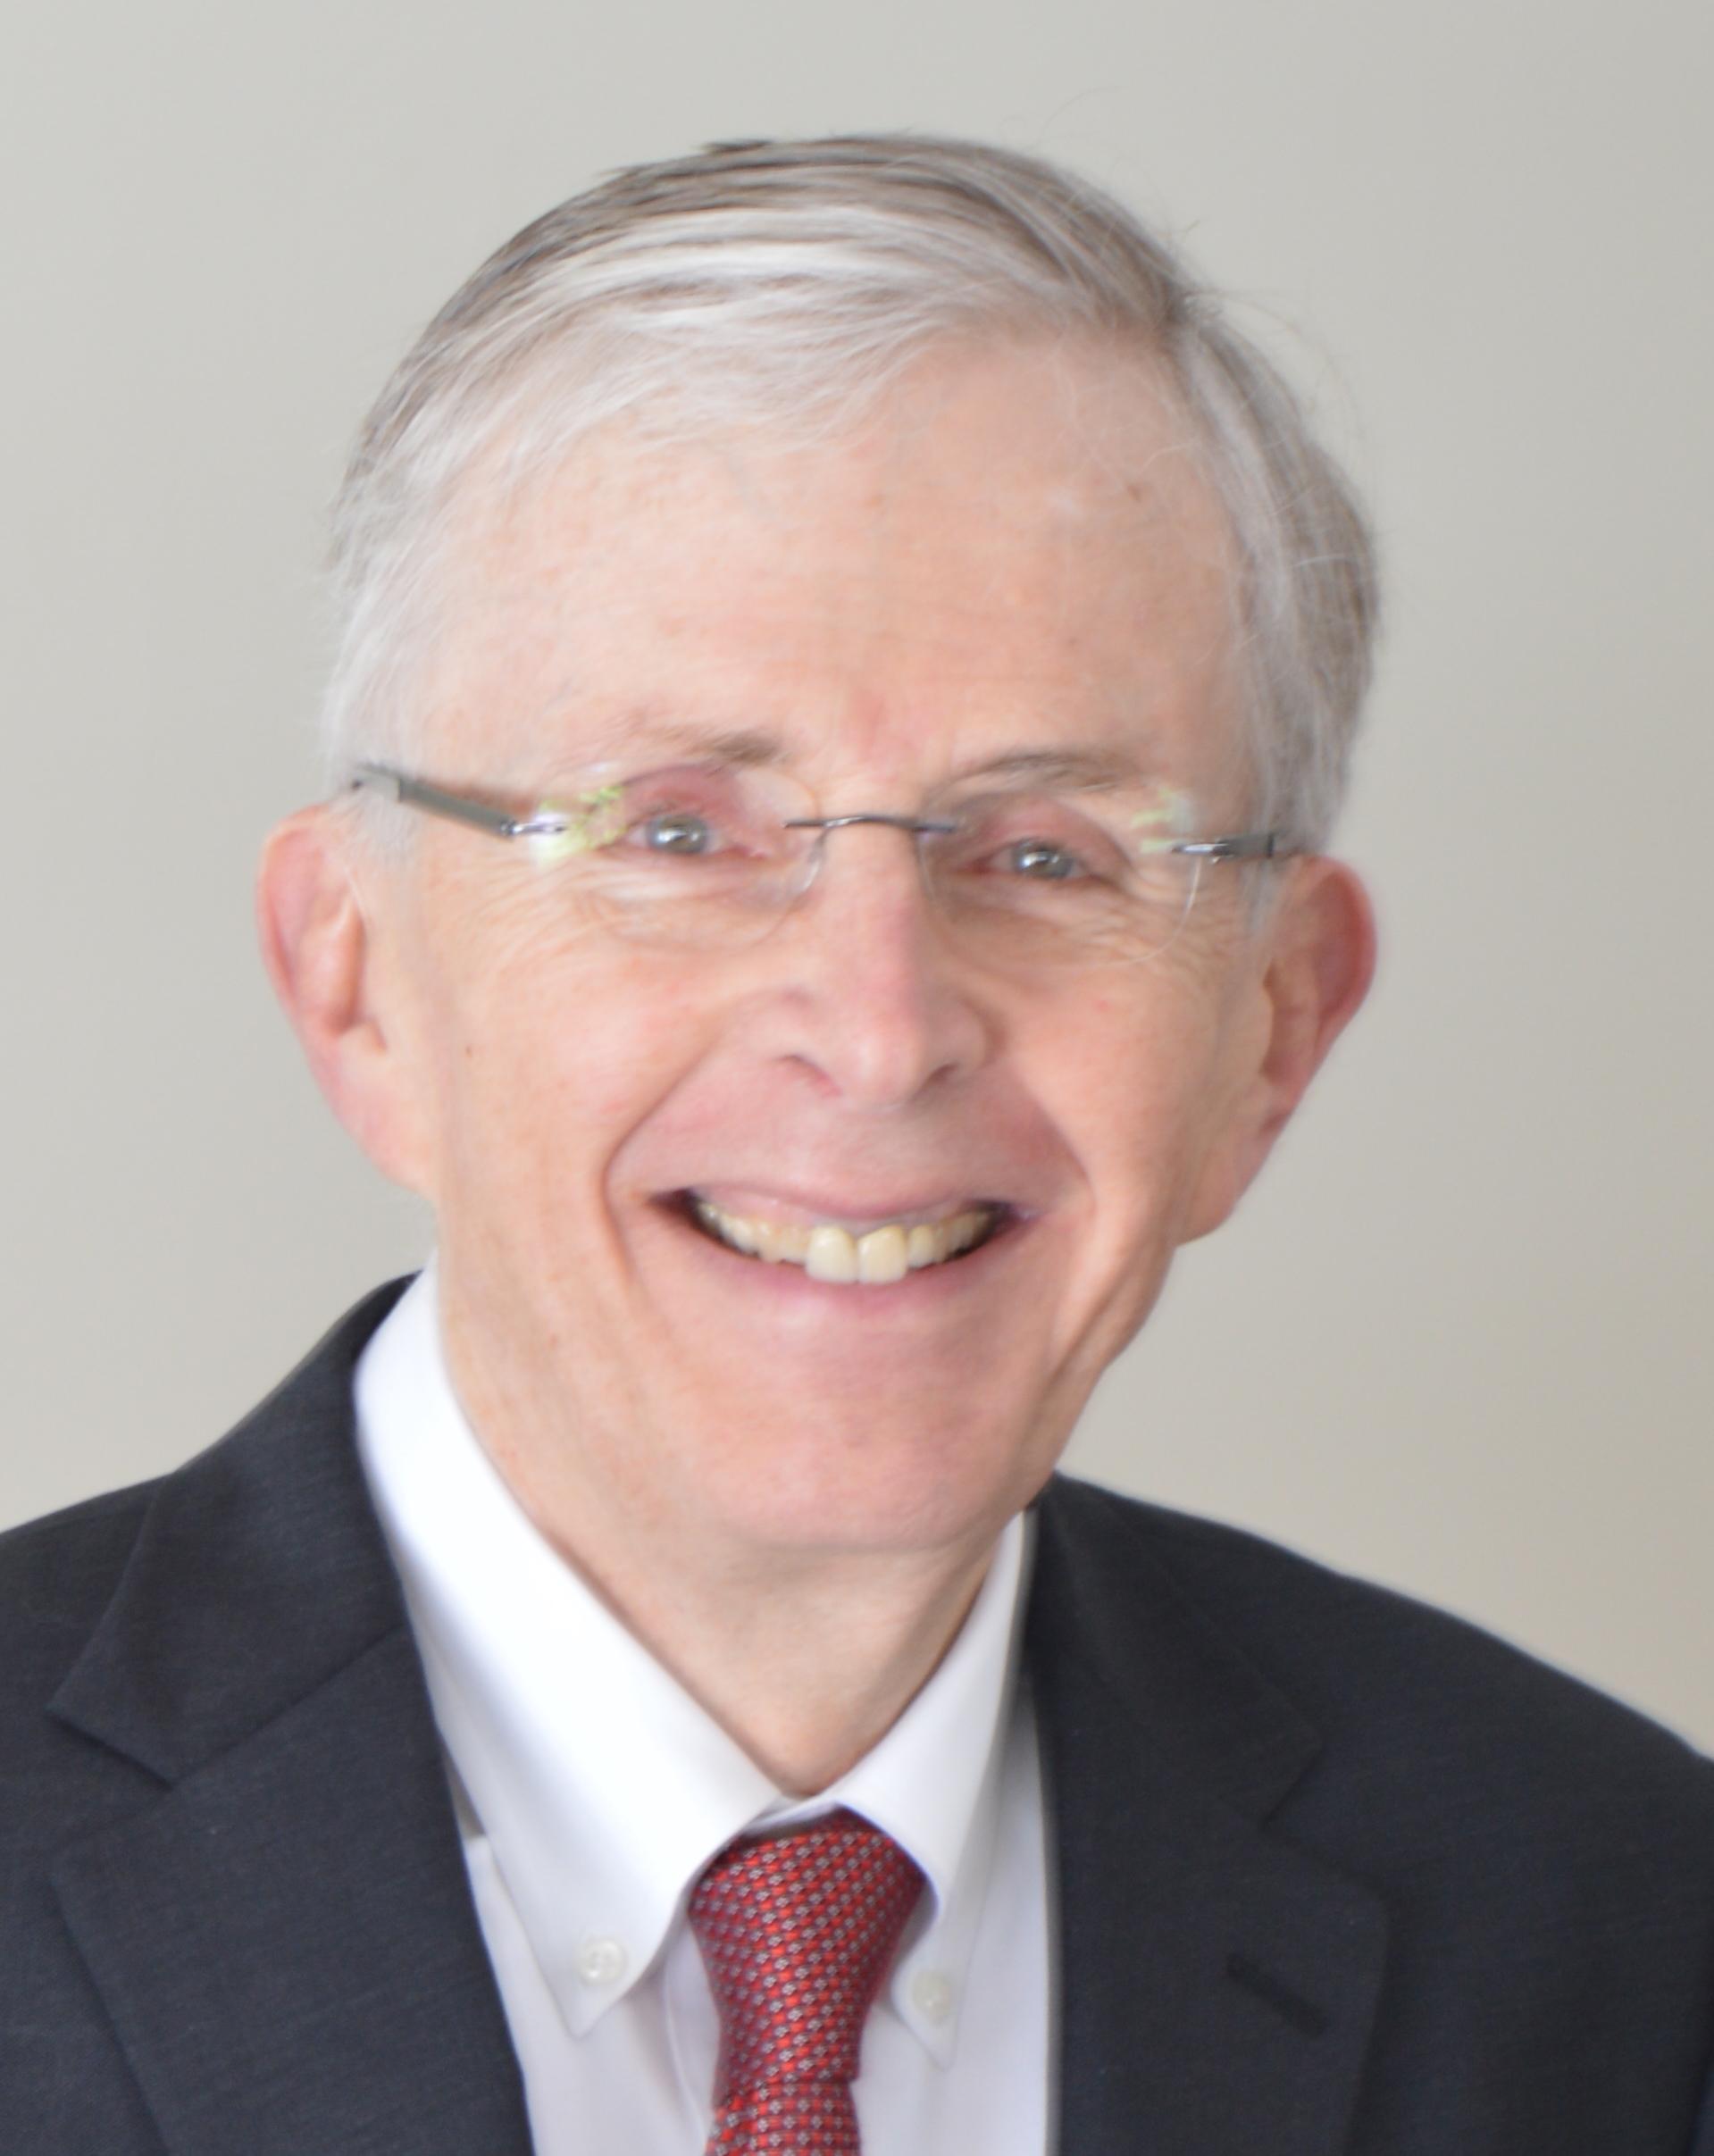 Tom Condon